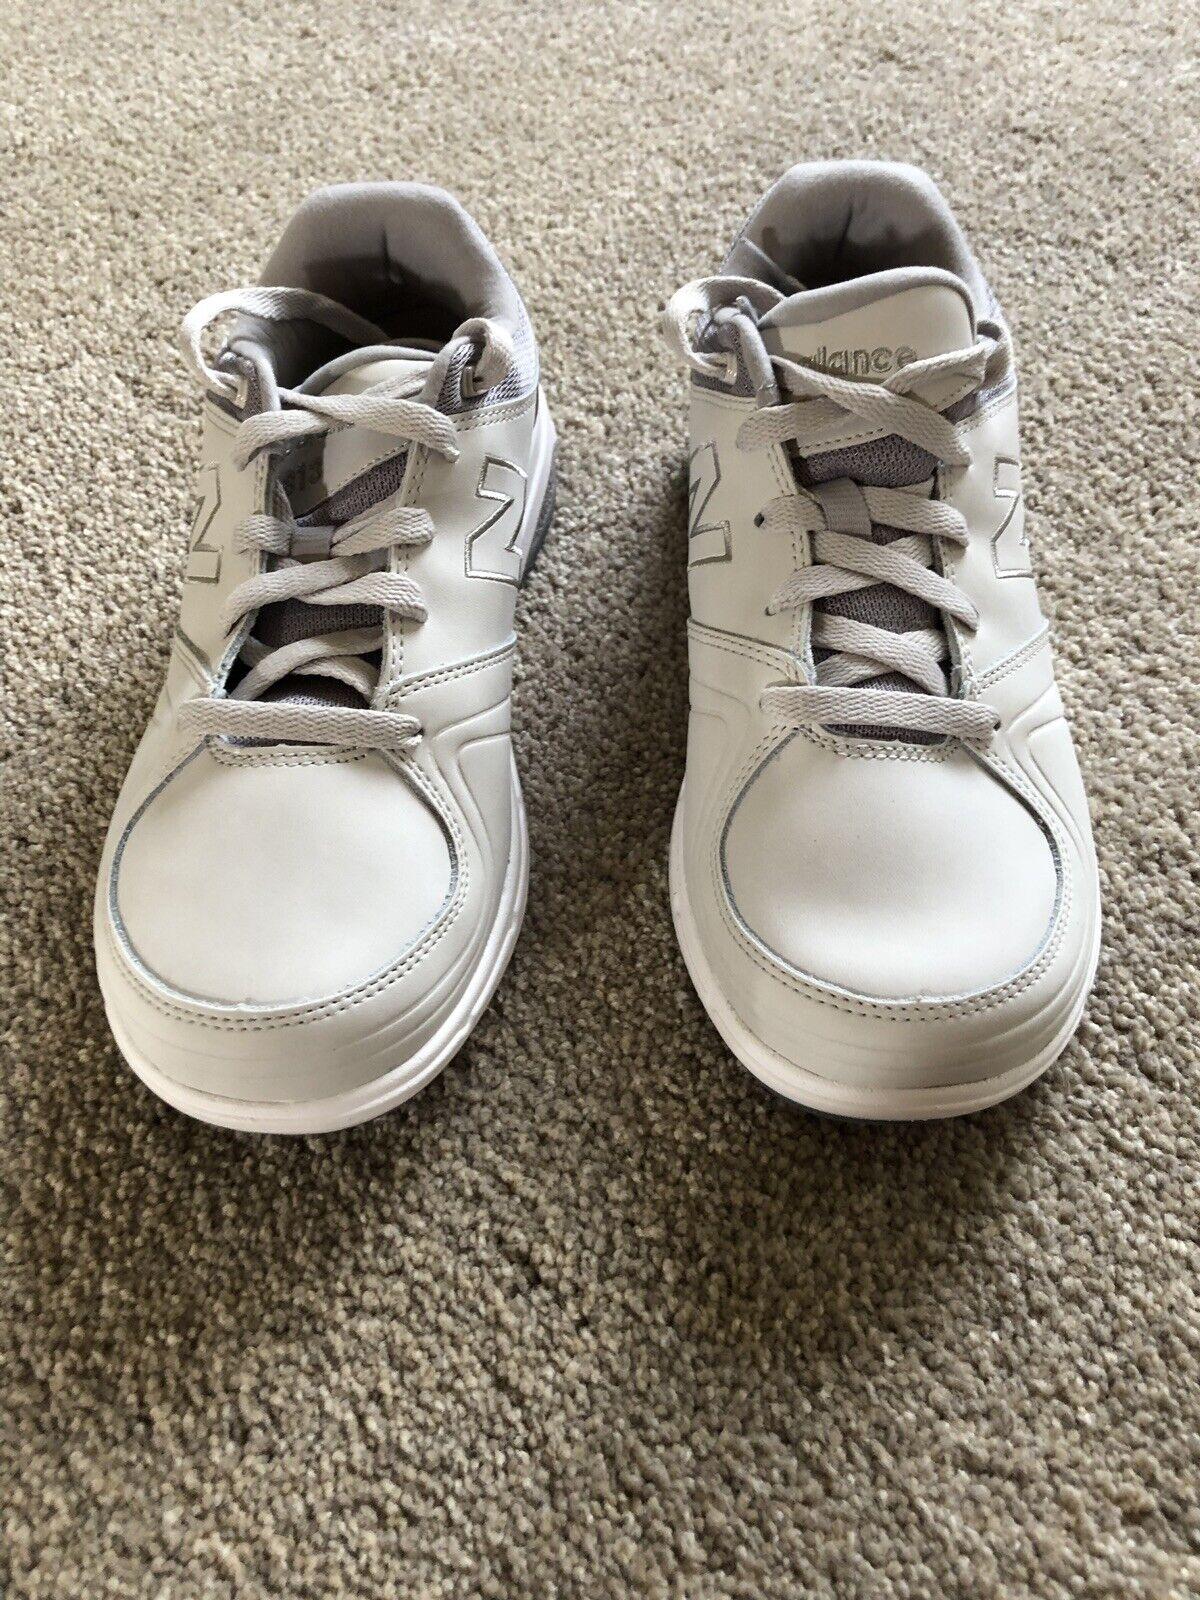 New Balance Walking Marche Women's Walking Tennis shoes Size US8Wide. WW813GY1